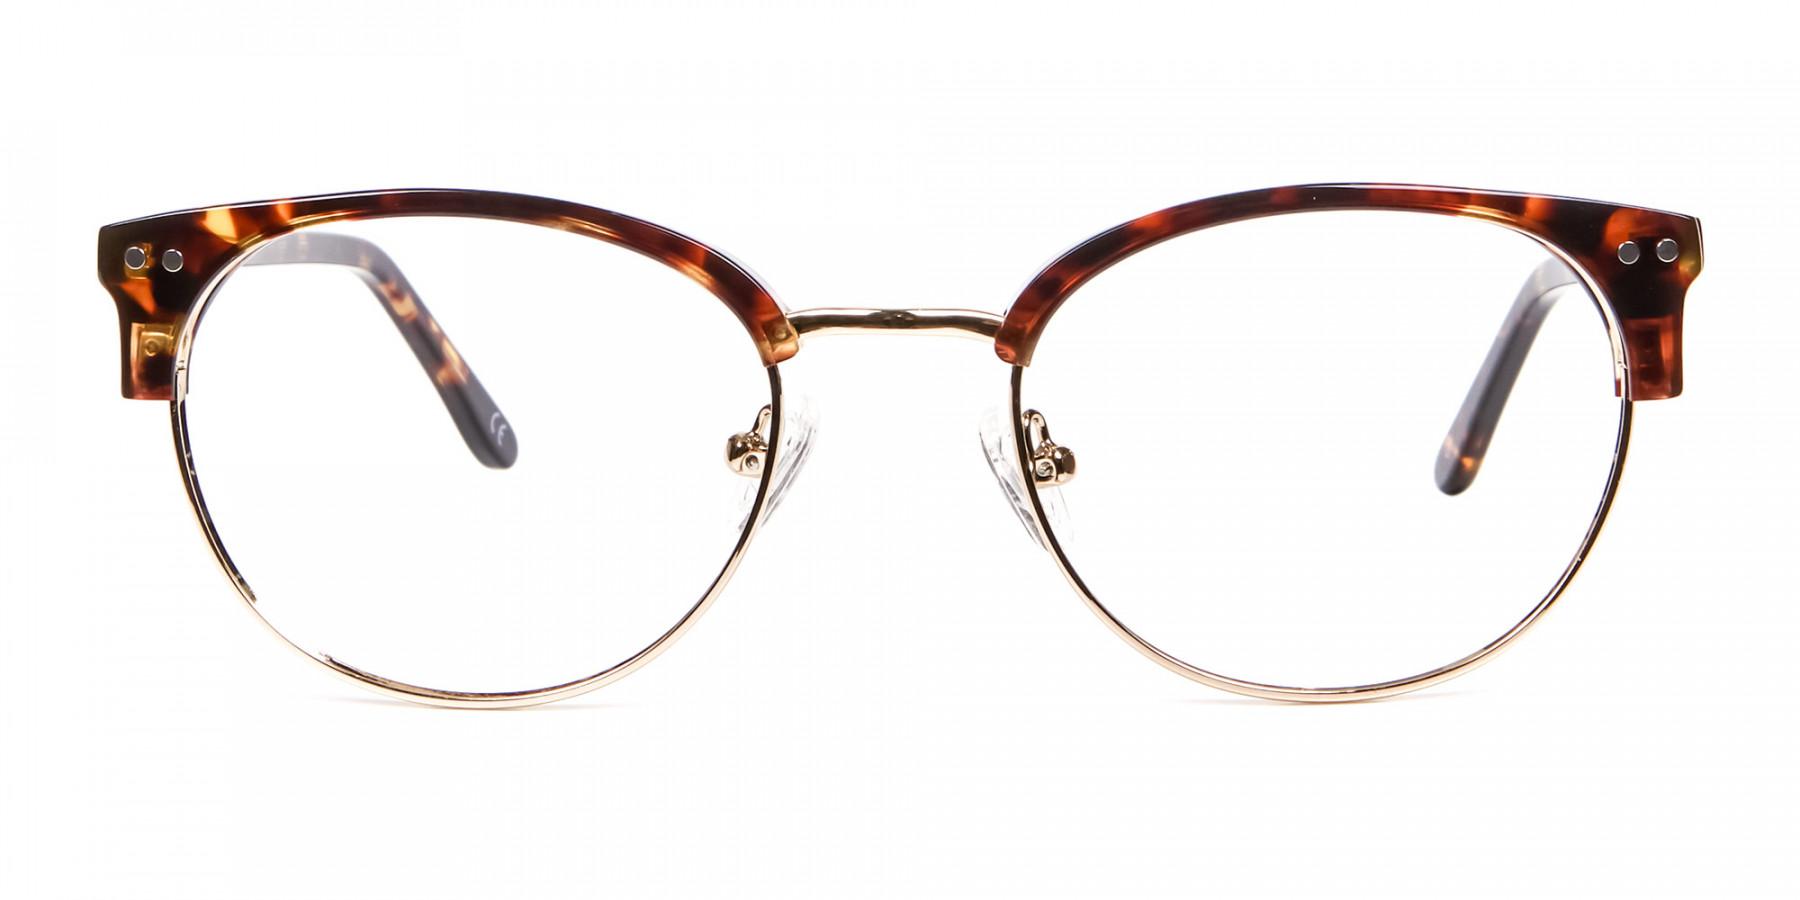 Havana Tortoise and Gold Glasses -1